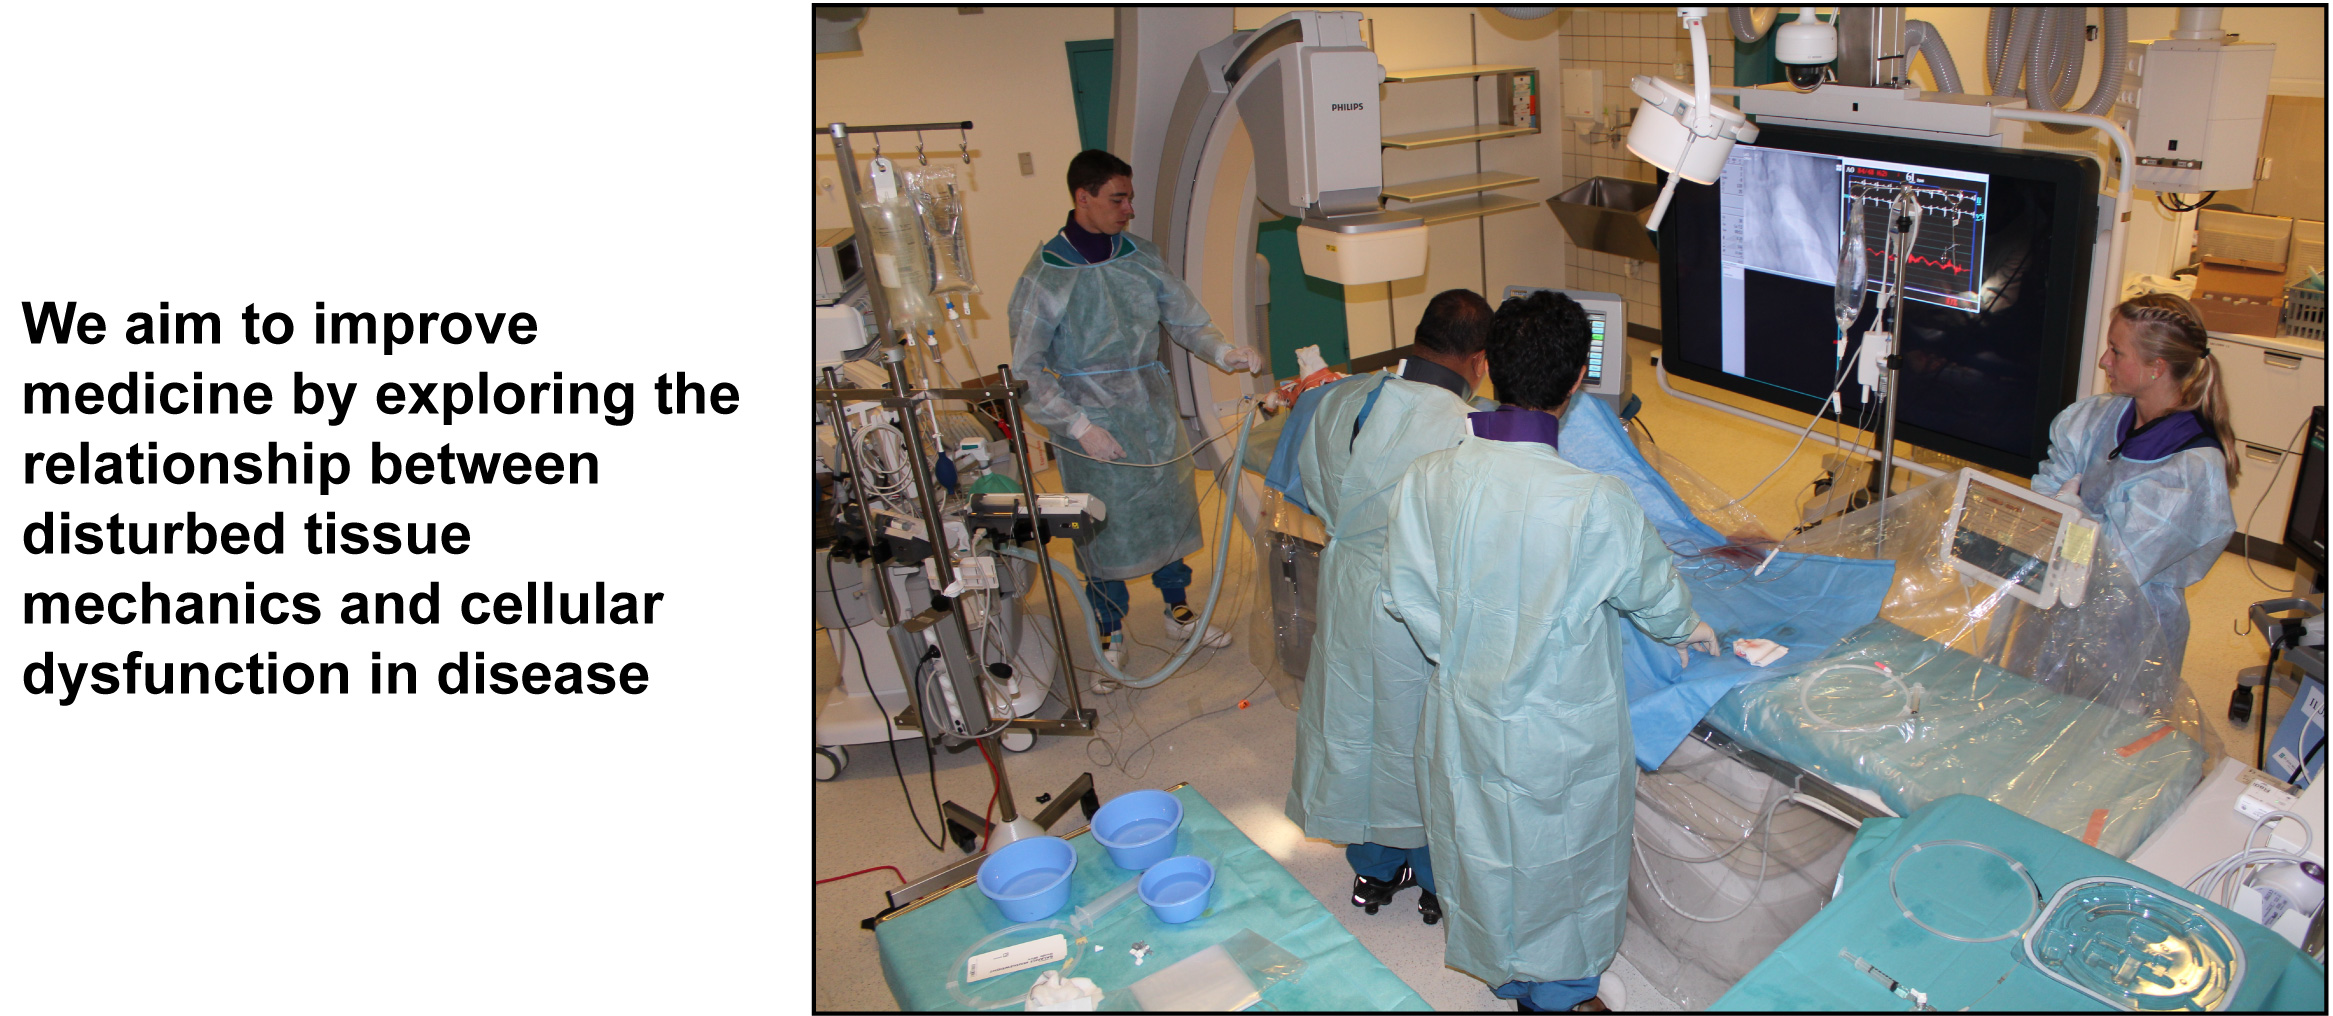 Collaborator Dr. Ranil de Silva implants a shear-modifying stent into the left anterior descending coronary artery of a hypercholesterolemic pig (Pedrigi et al., Circulation, 2015).